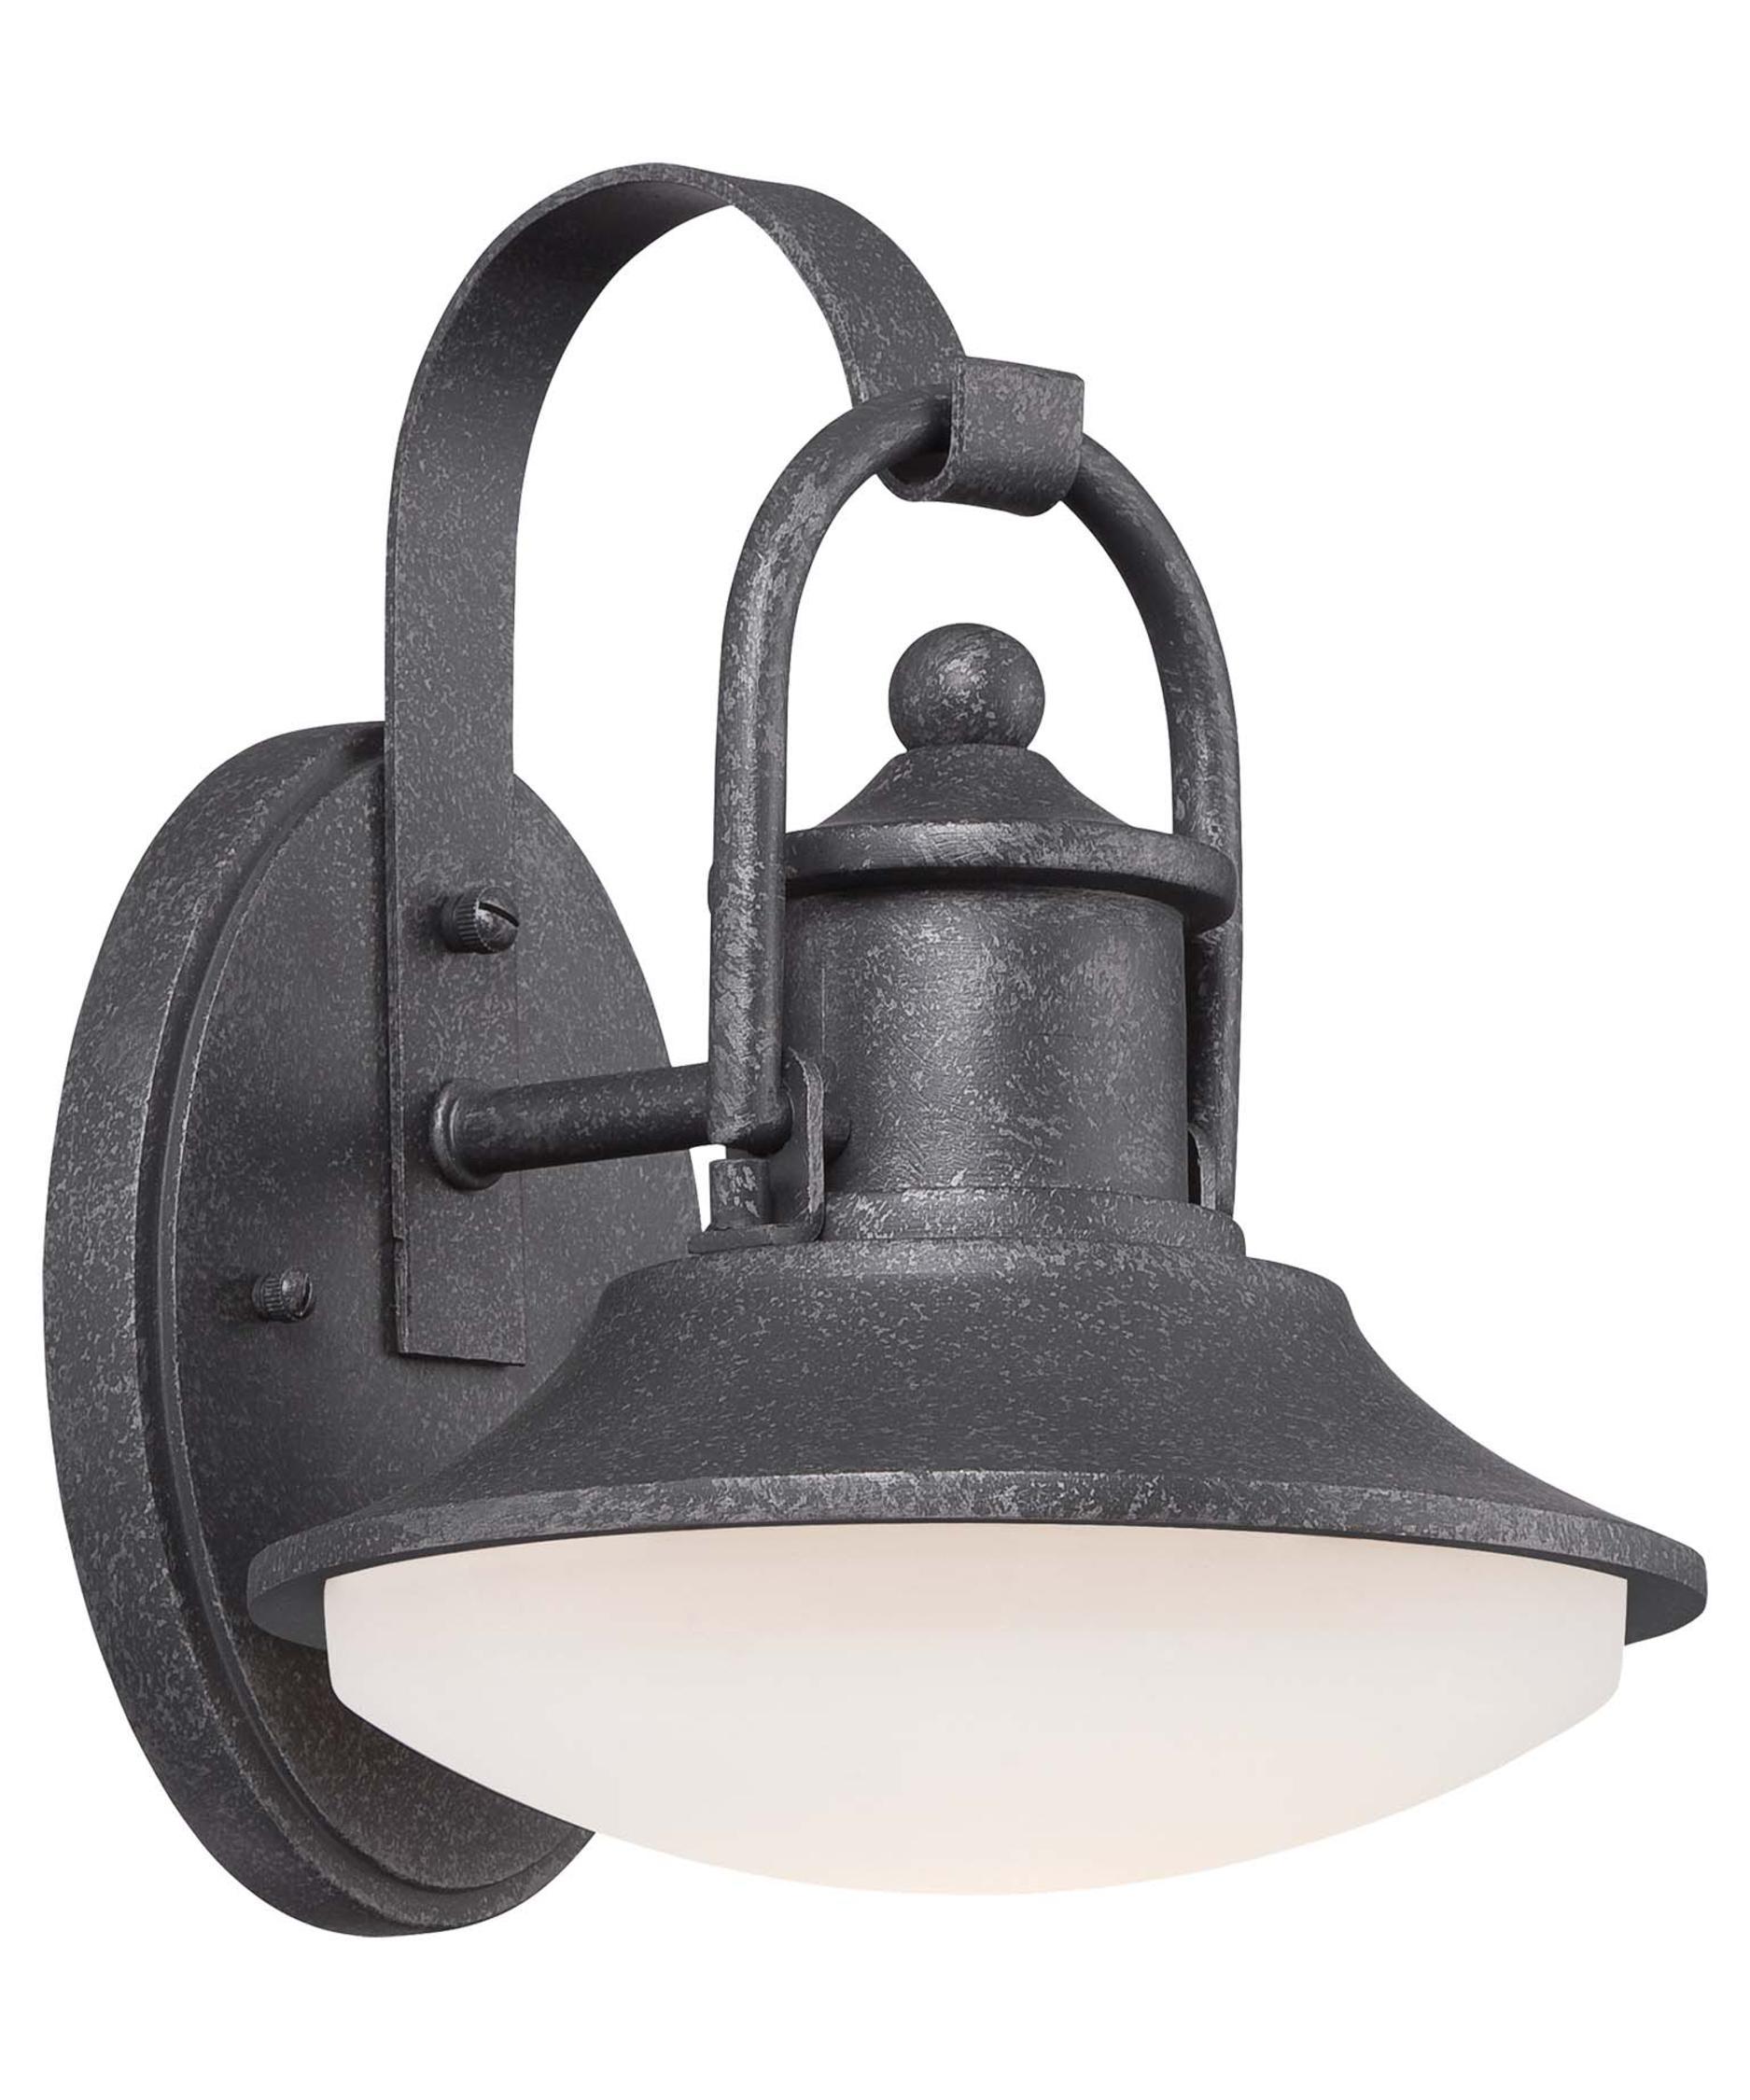 Elegant Minka Lavery 8131 Crest Ridge 8 Inch Wide 1 Light Outdoor Wall Light |  Capitol Lighting 1 800lighting.com